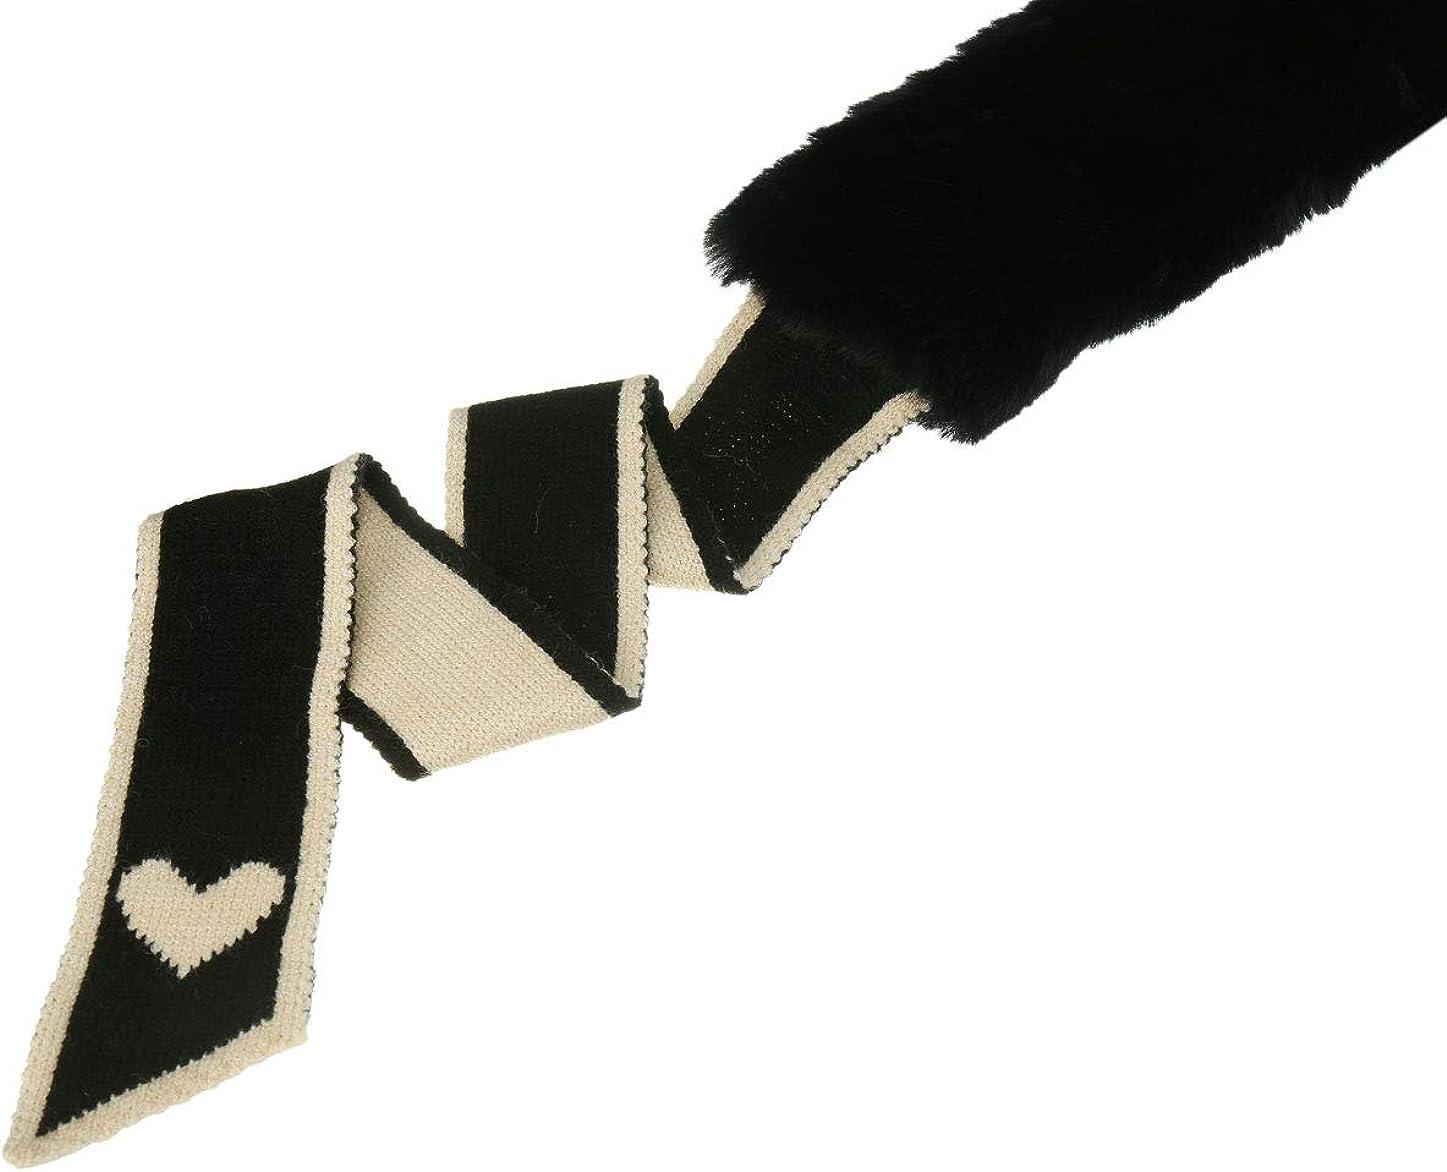 Allegra K Faux Fur Winter Collar Scarf Thick Plush Neck Scarves Wrap Warmer Shawl for Women Lady